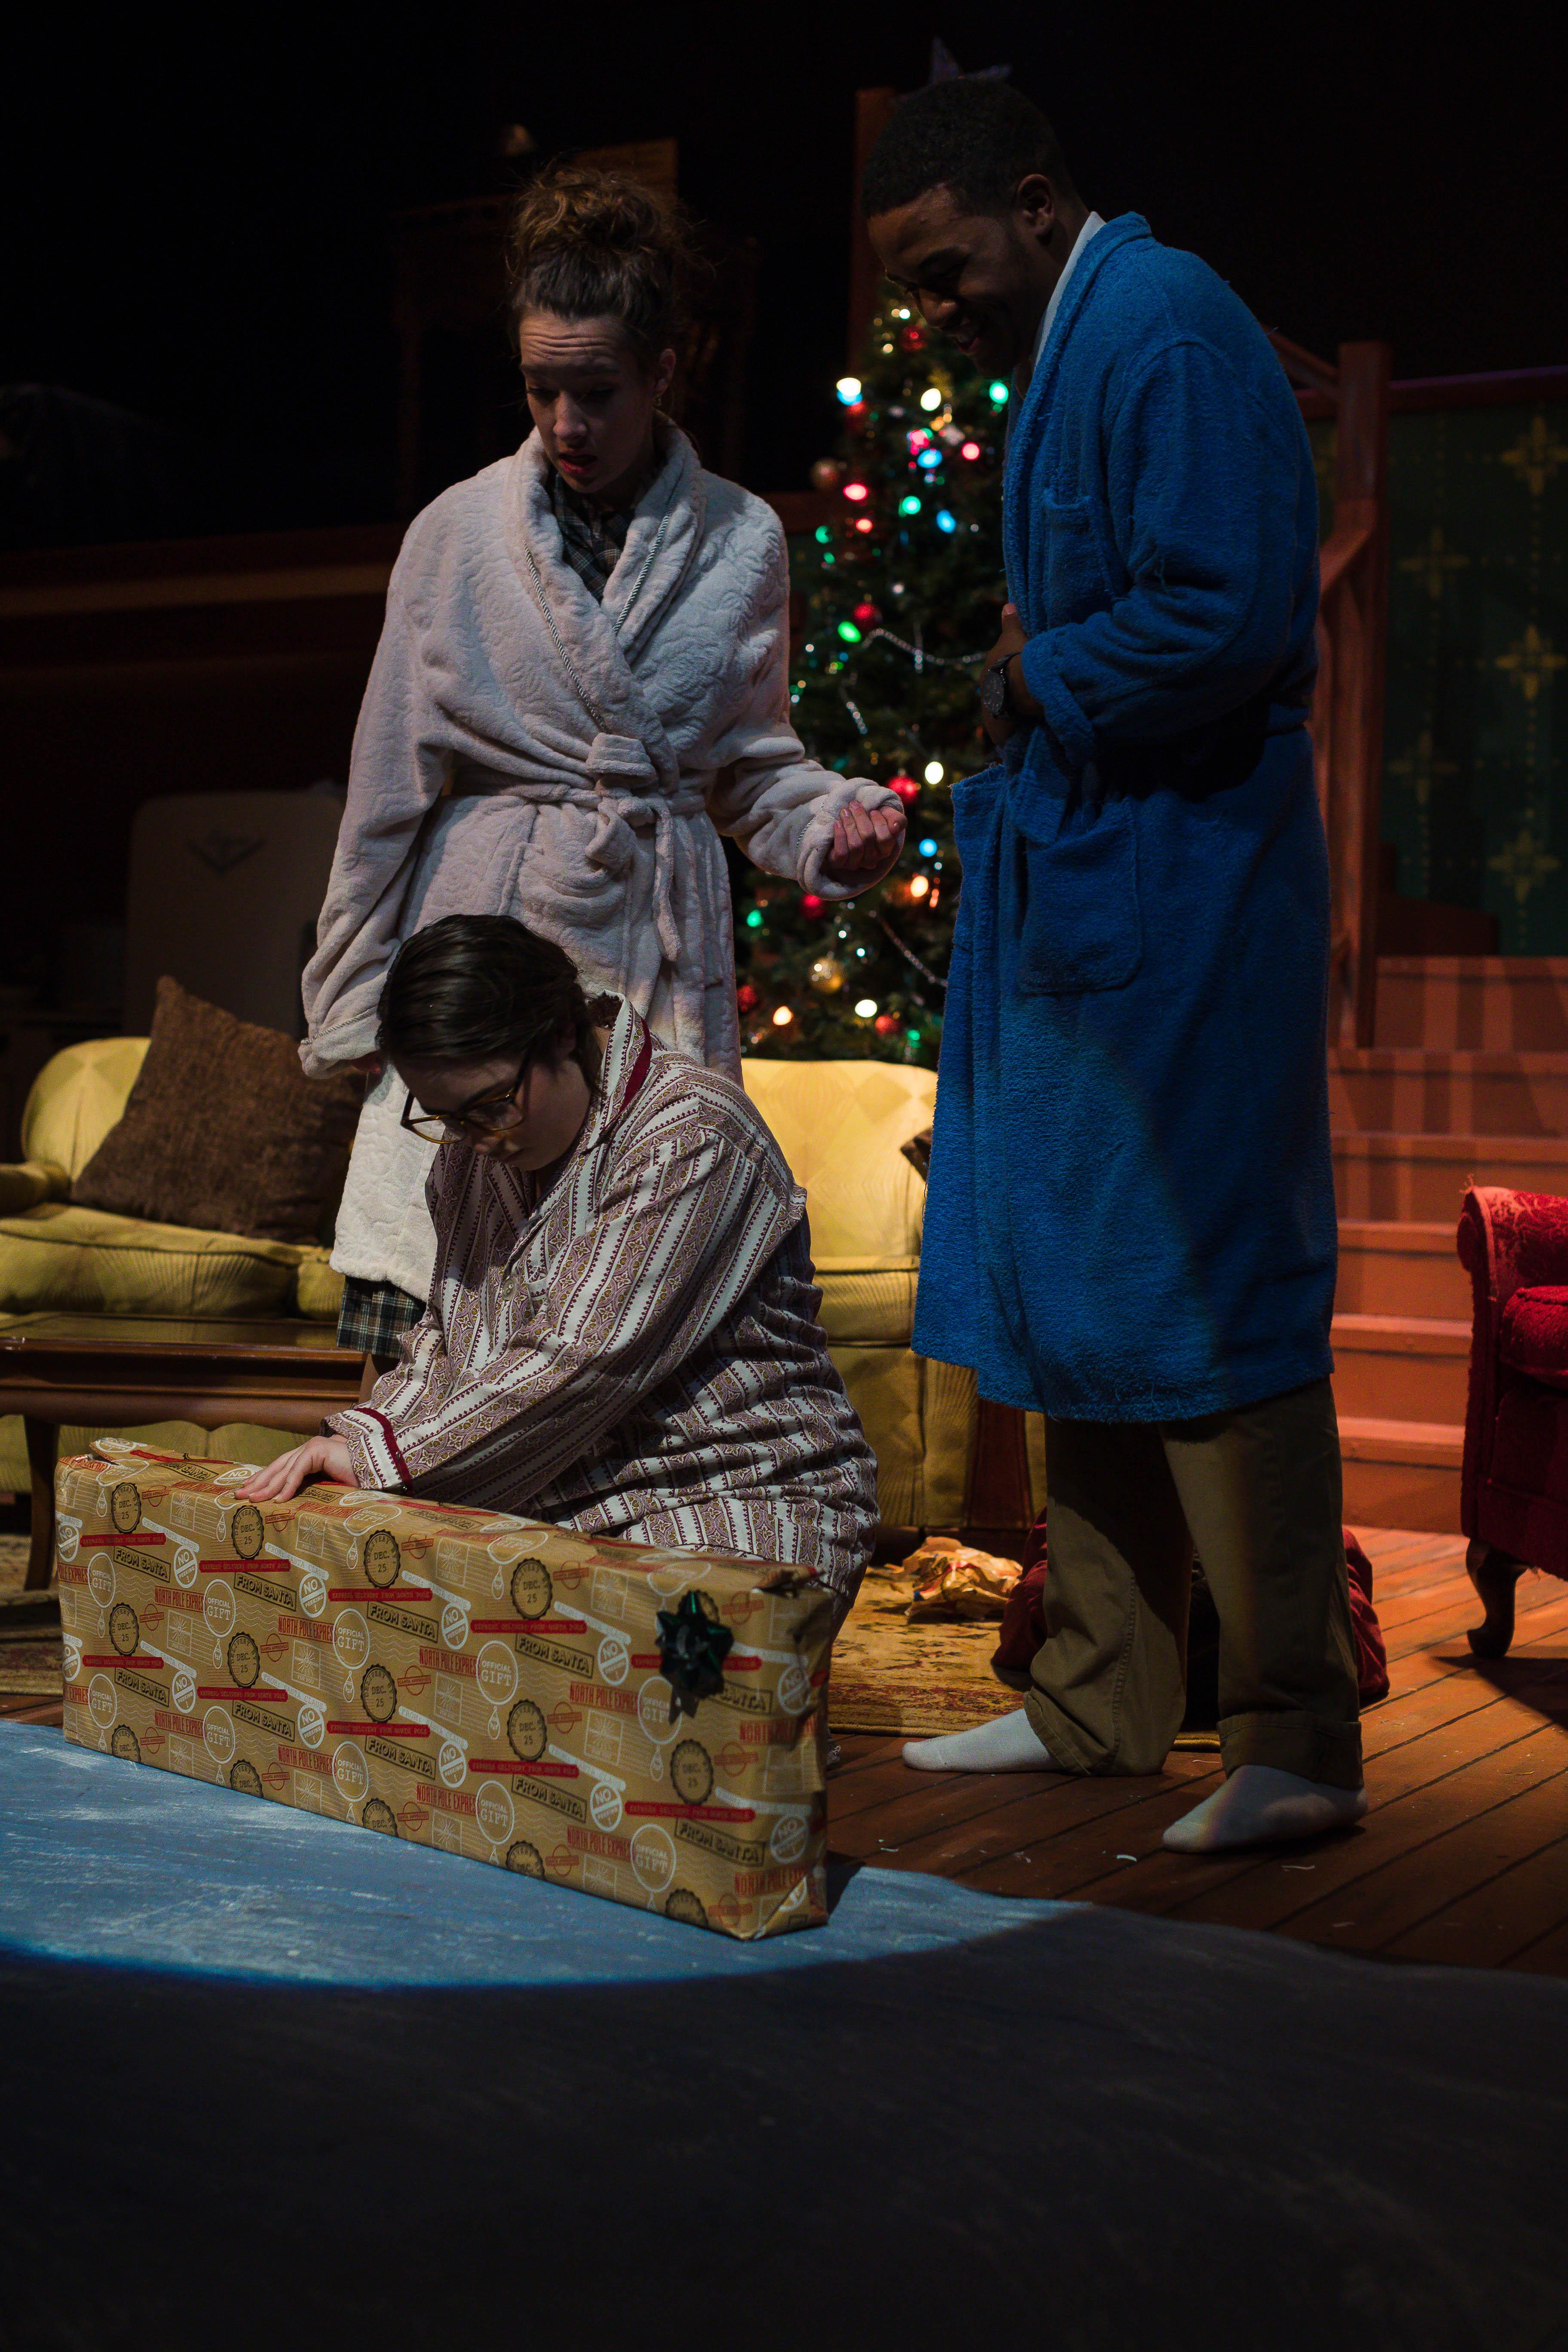 Weaver_Christmasshoot-_MG_1541